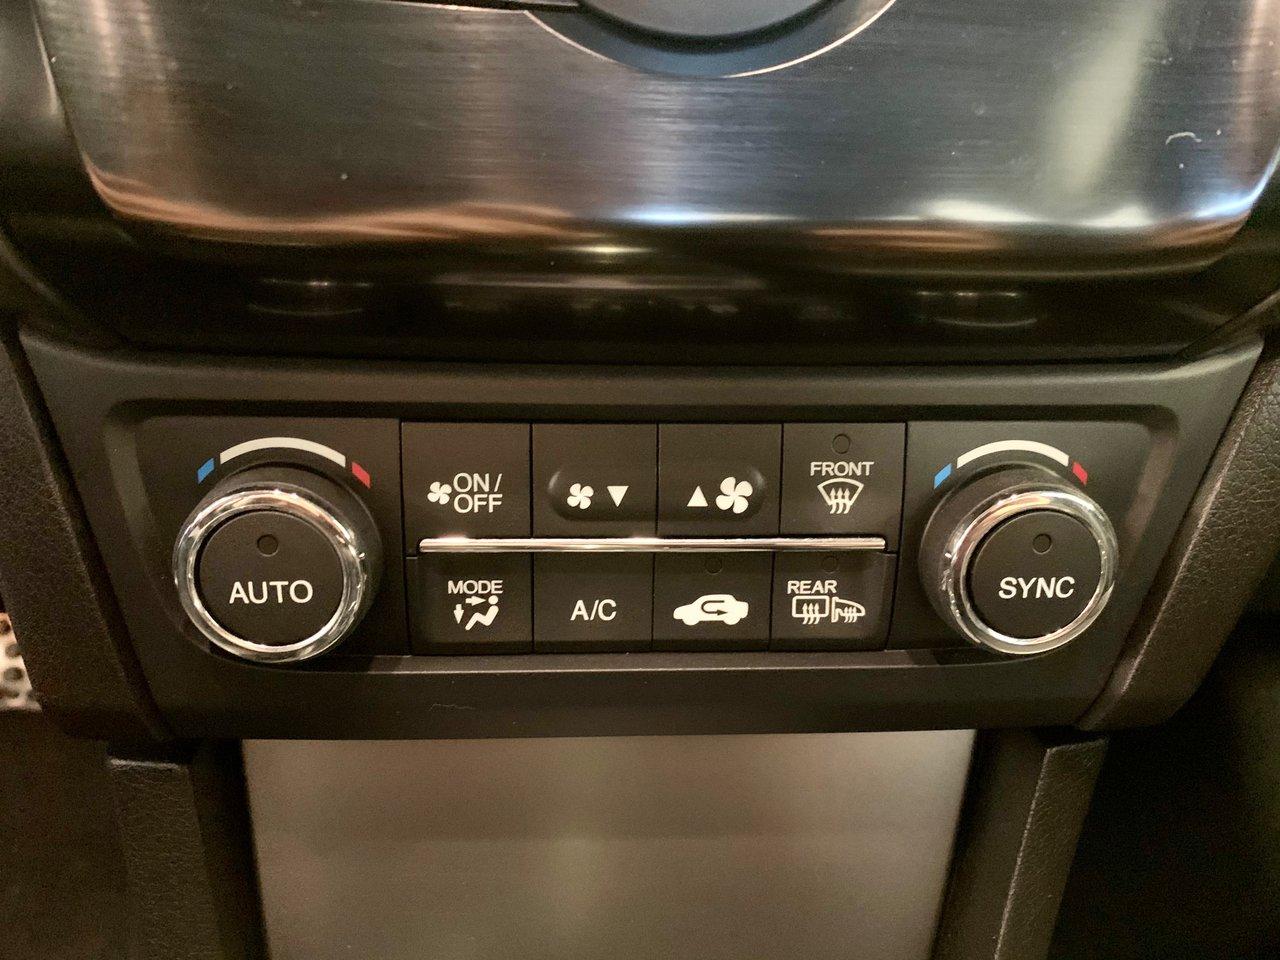 2013 Acura ILX Dynamic / JAMAIS ACCIDENTEE